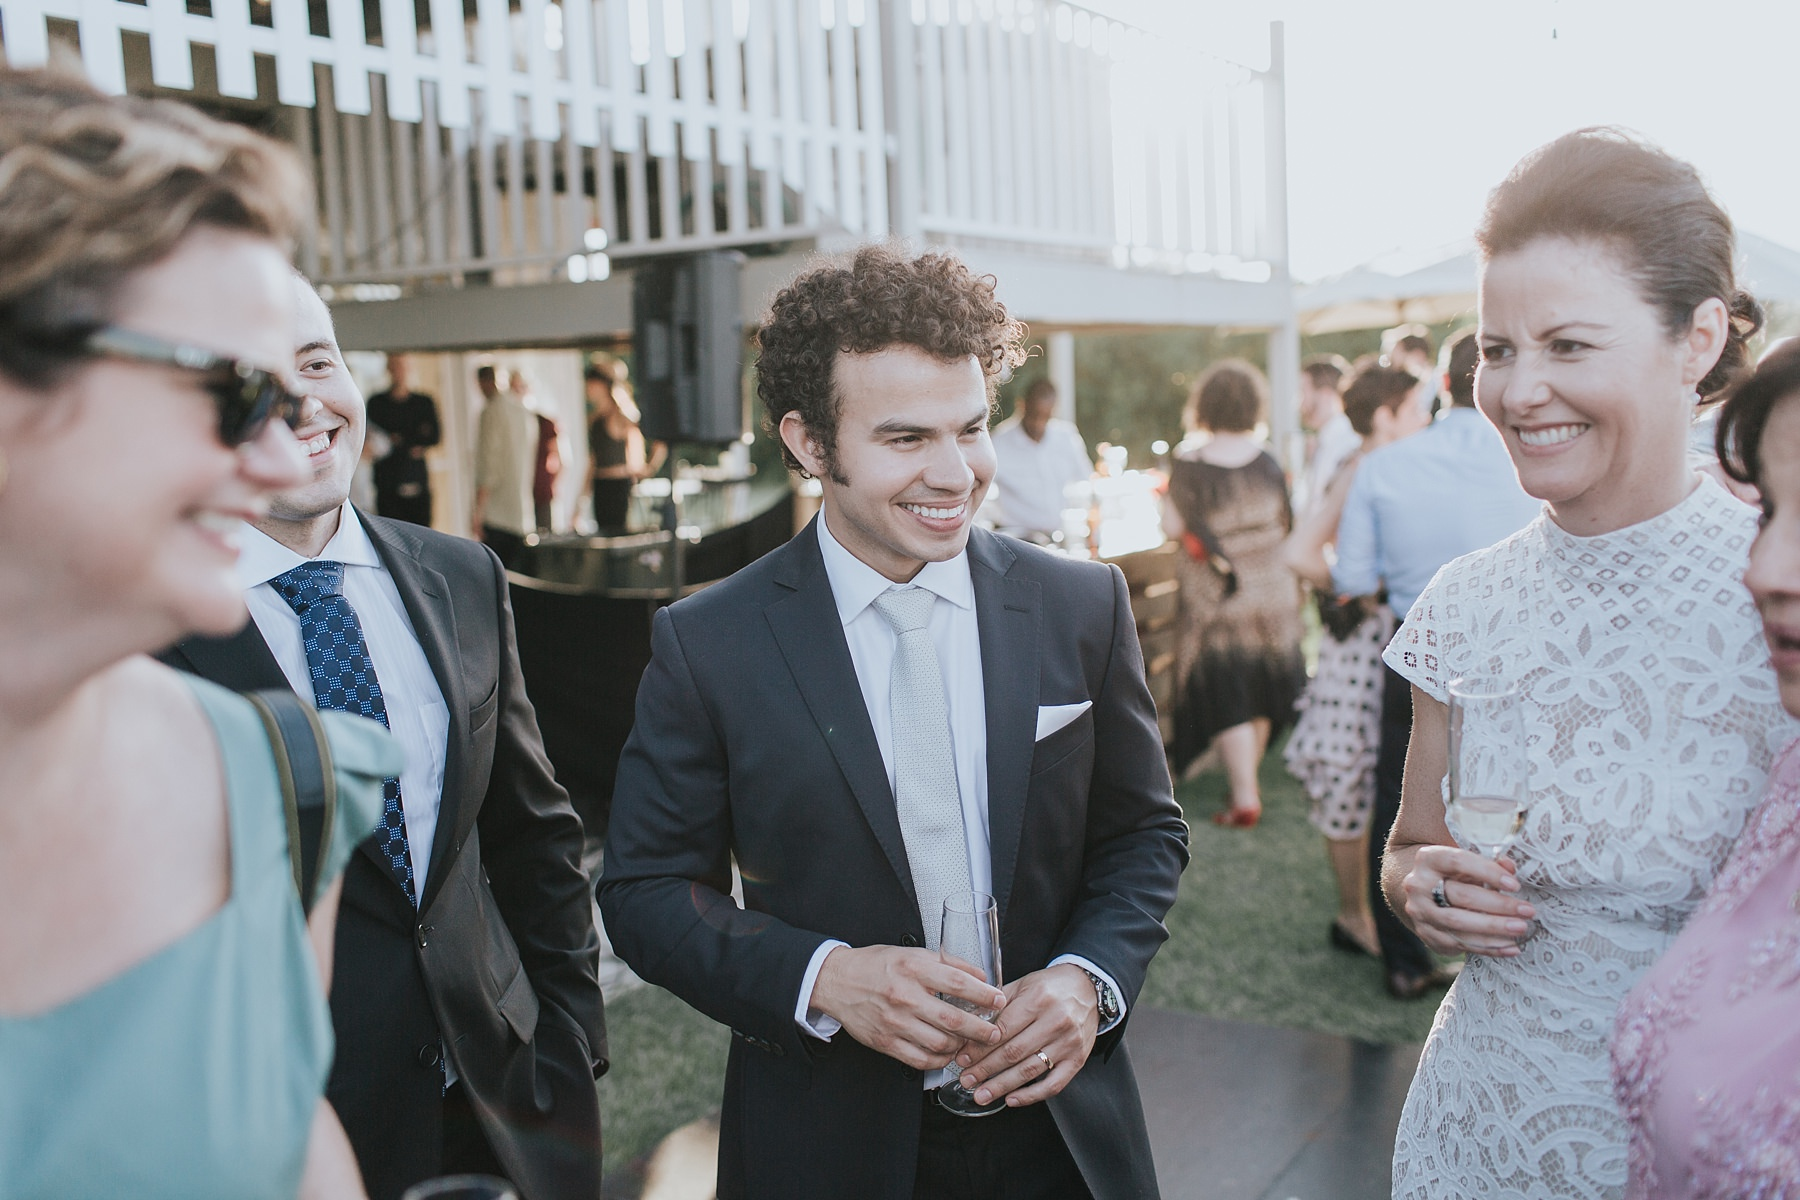 groom candid photos after wedding ceremony